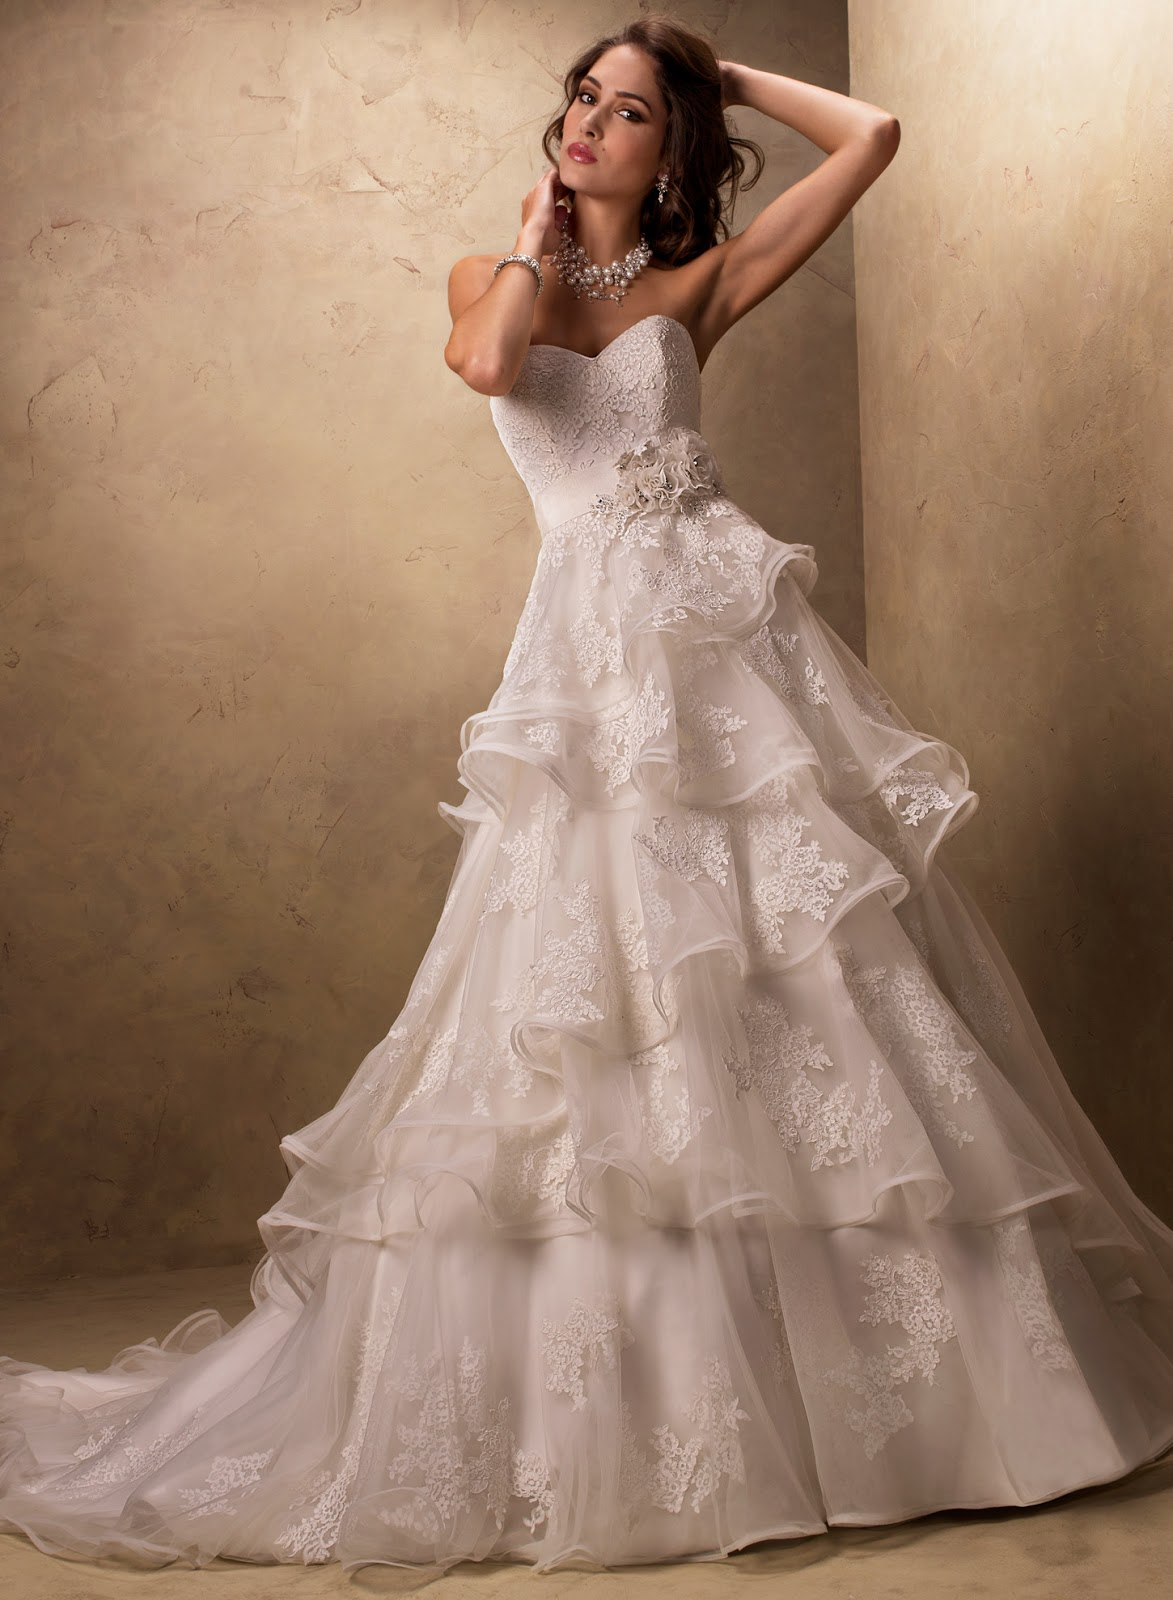 Blog Of Wedding And Occasion Wear: 2014 Fairy Tale Wedding